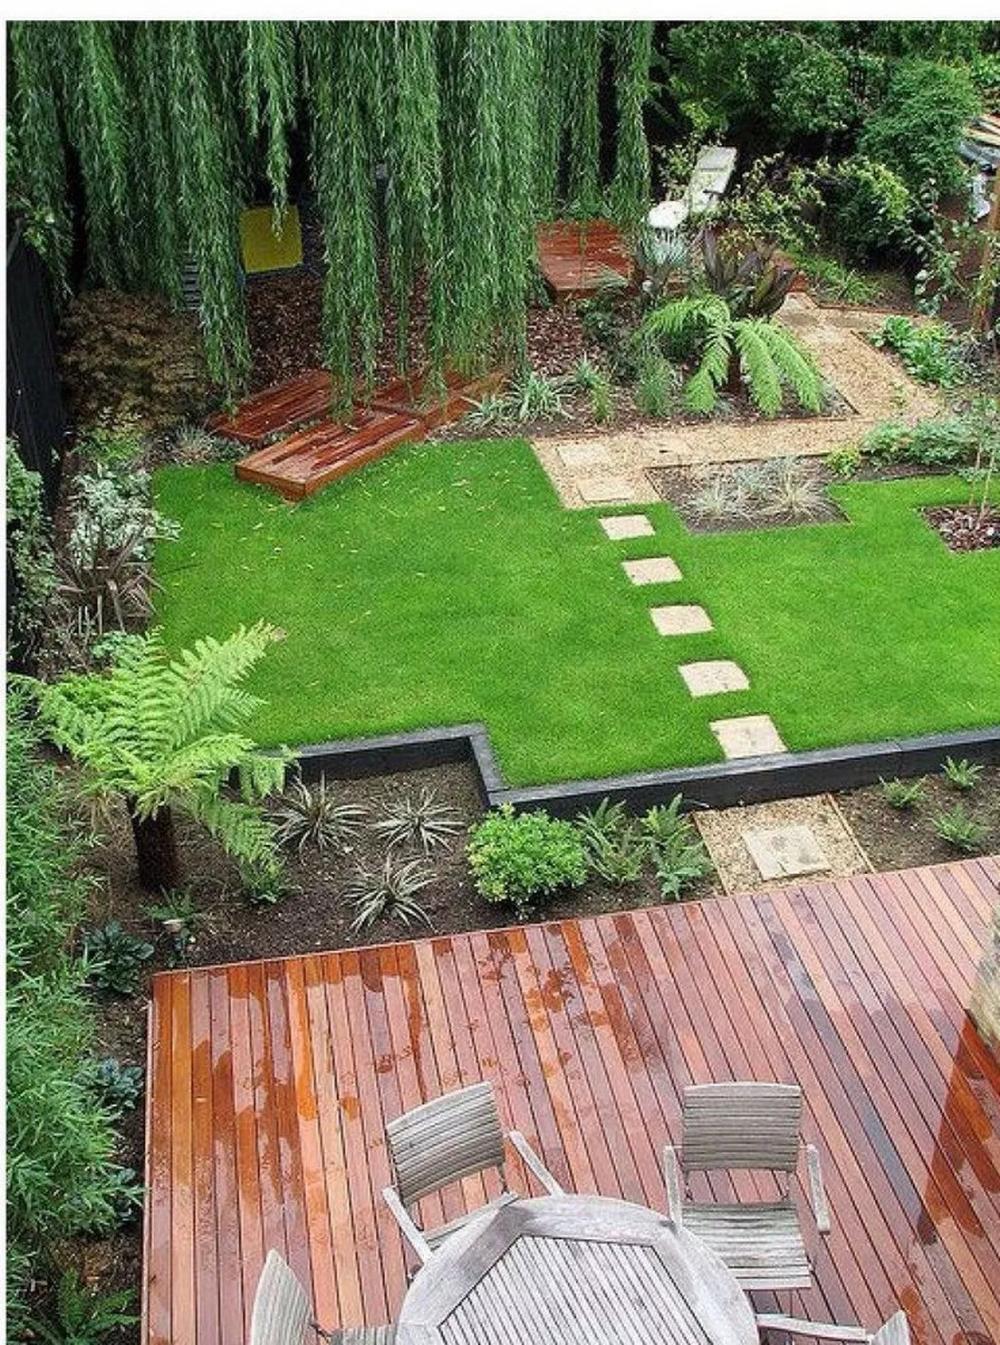 46 fresh backyard landscaping design ideas on a budget 11 ...